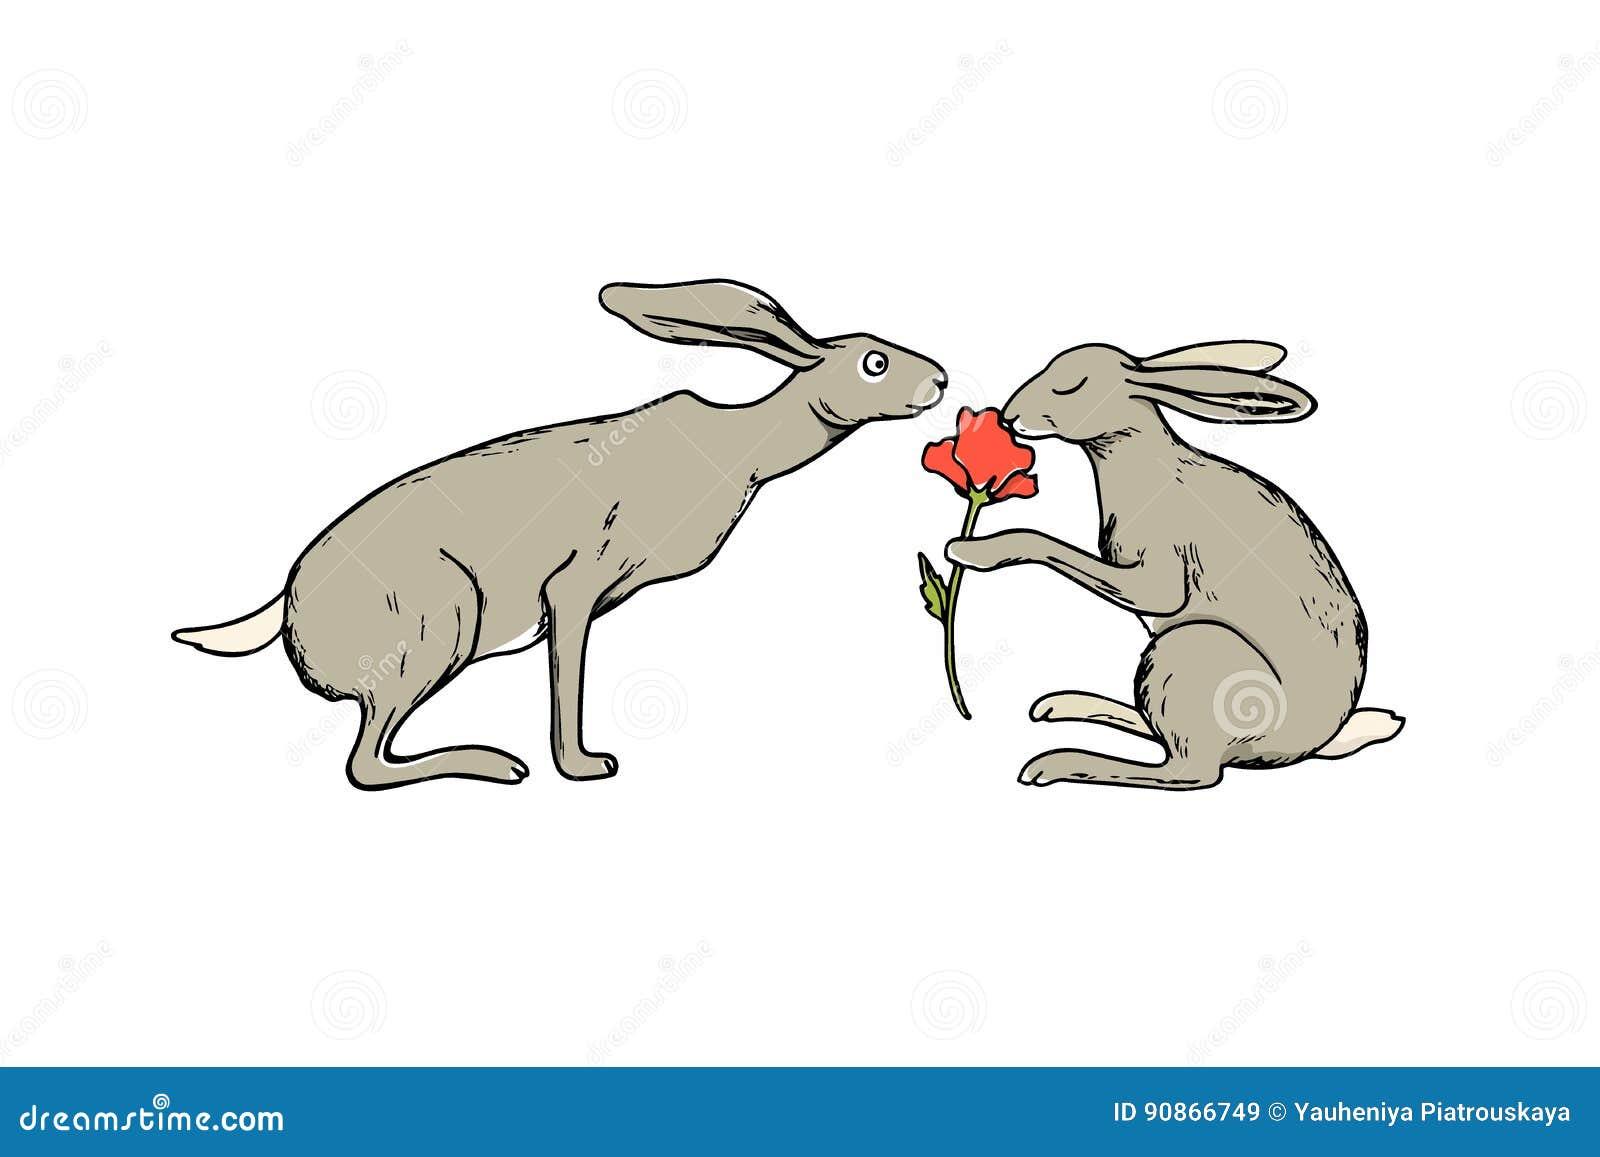 Tilde hare do it yourself